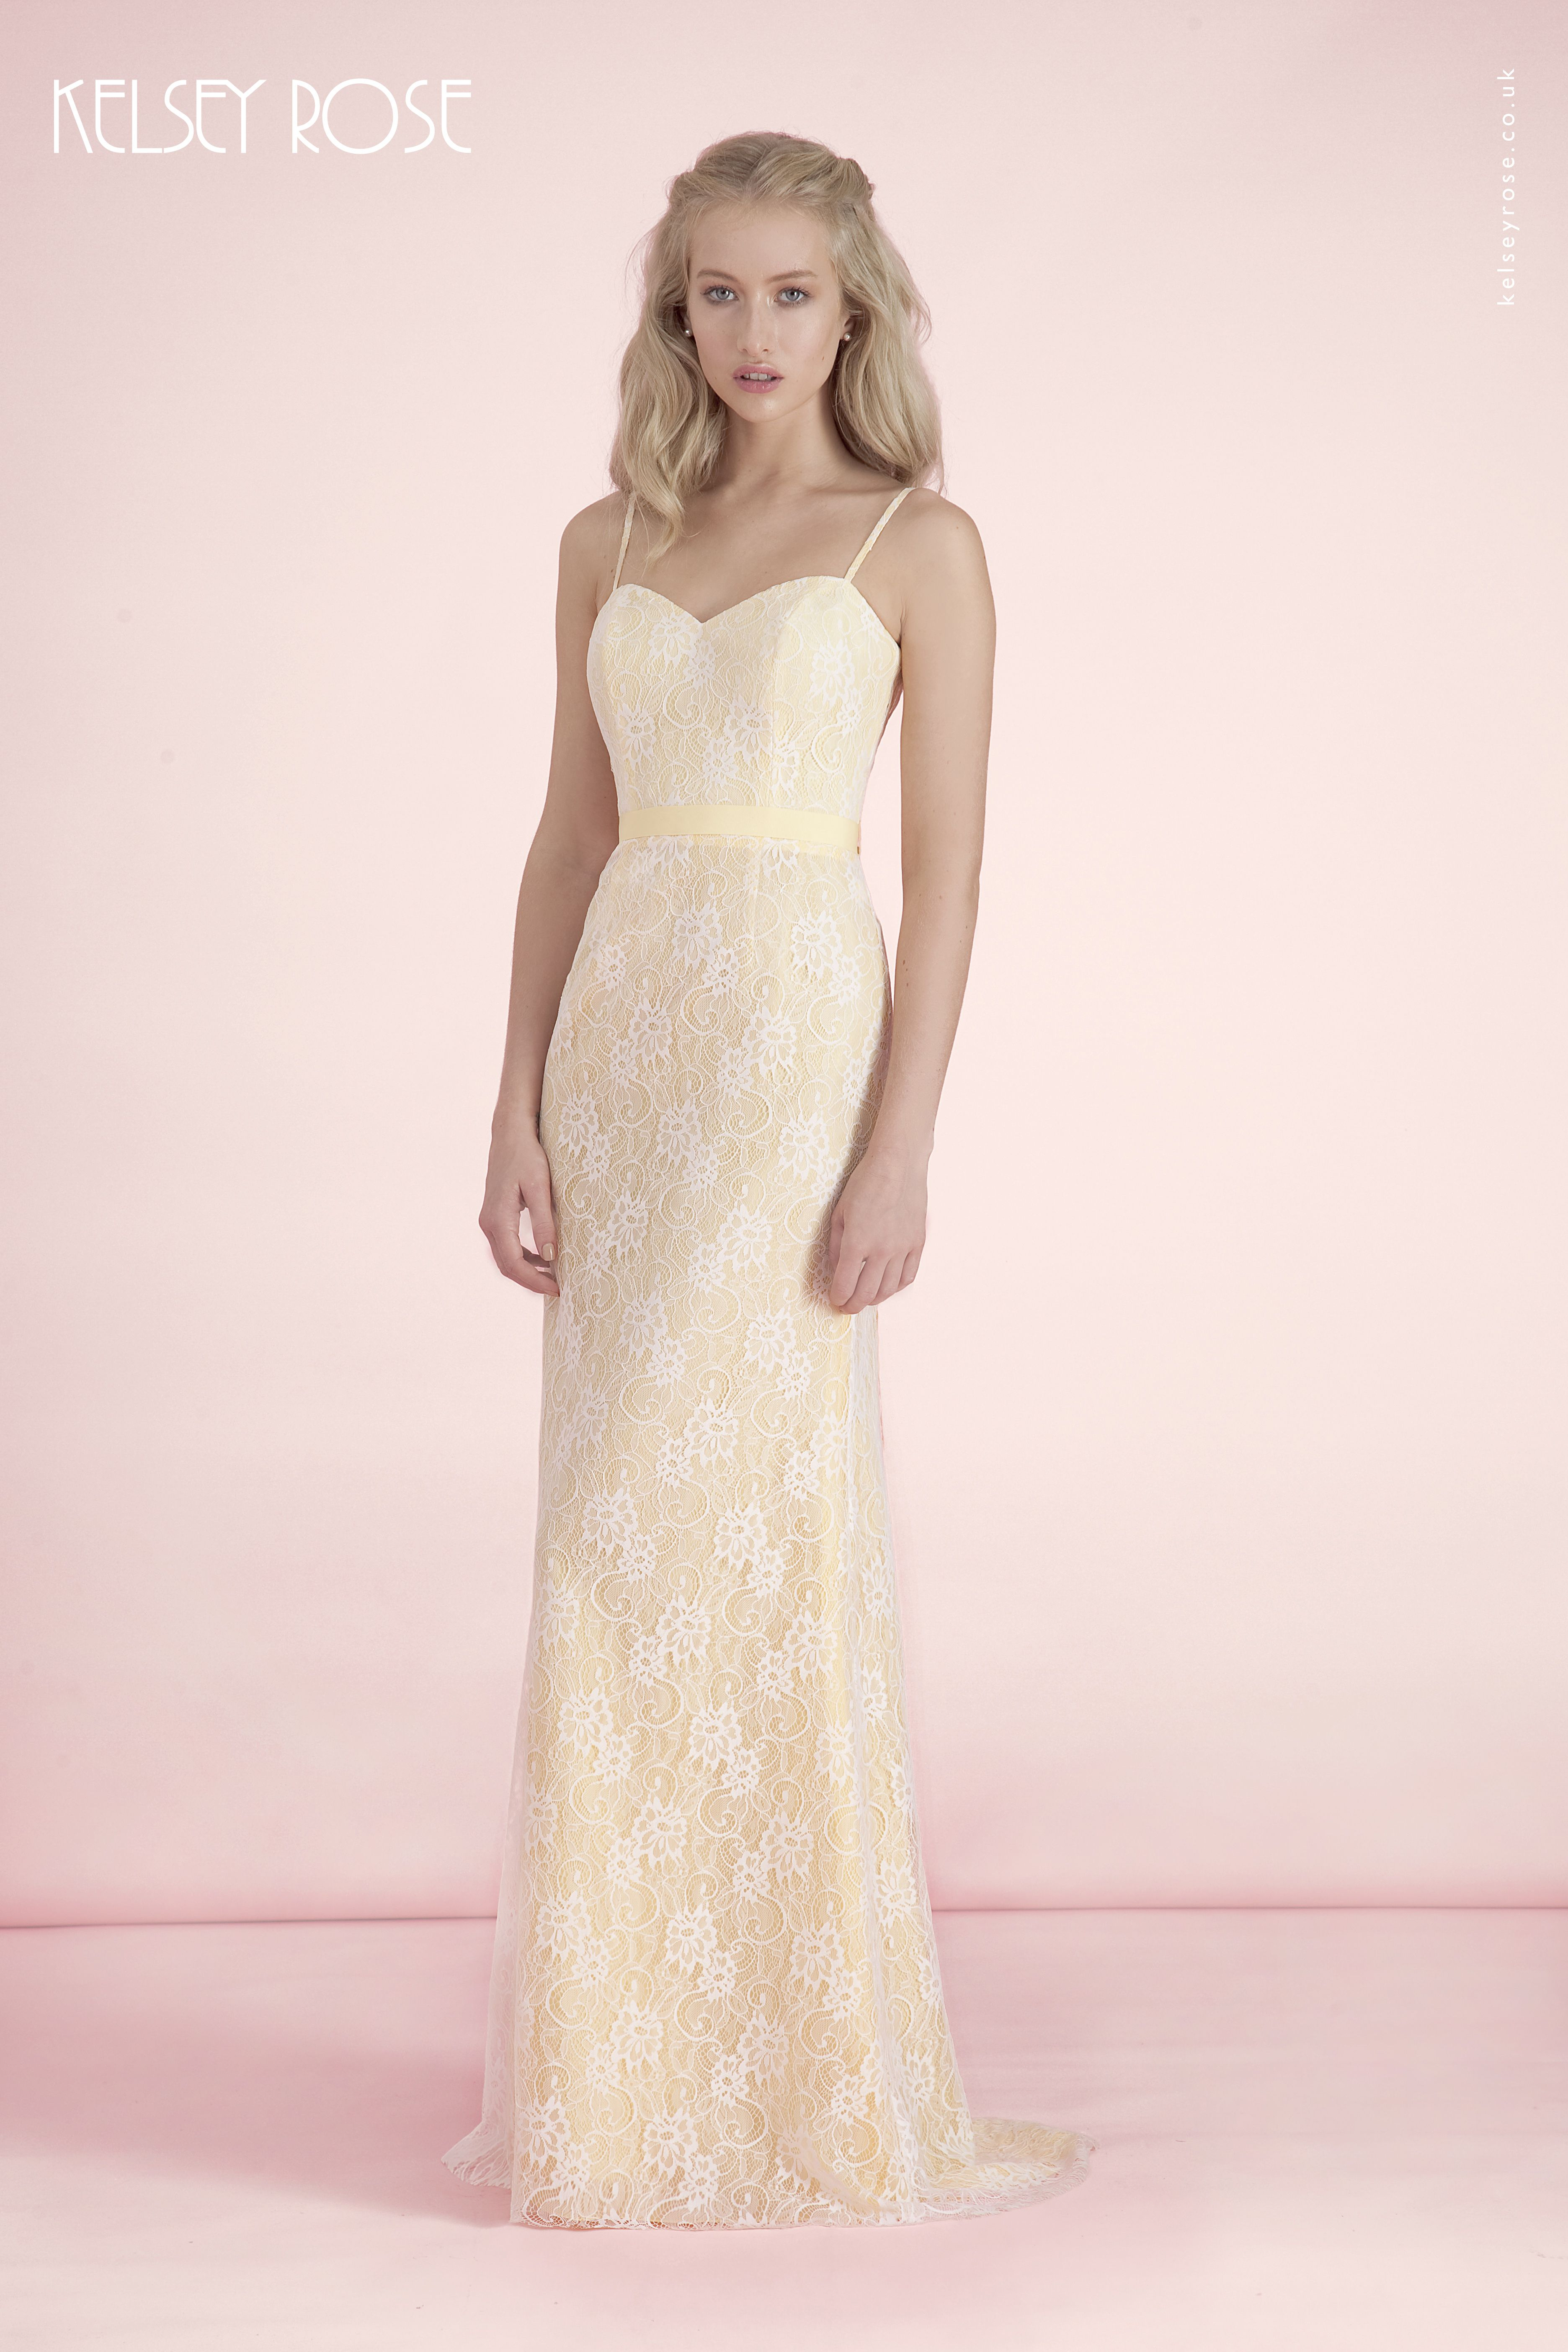 Dresses for summer wedding reception  Kelsey Rose Bridesmaid Style   My Style  Pinterest  Wedding